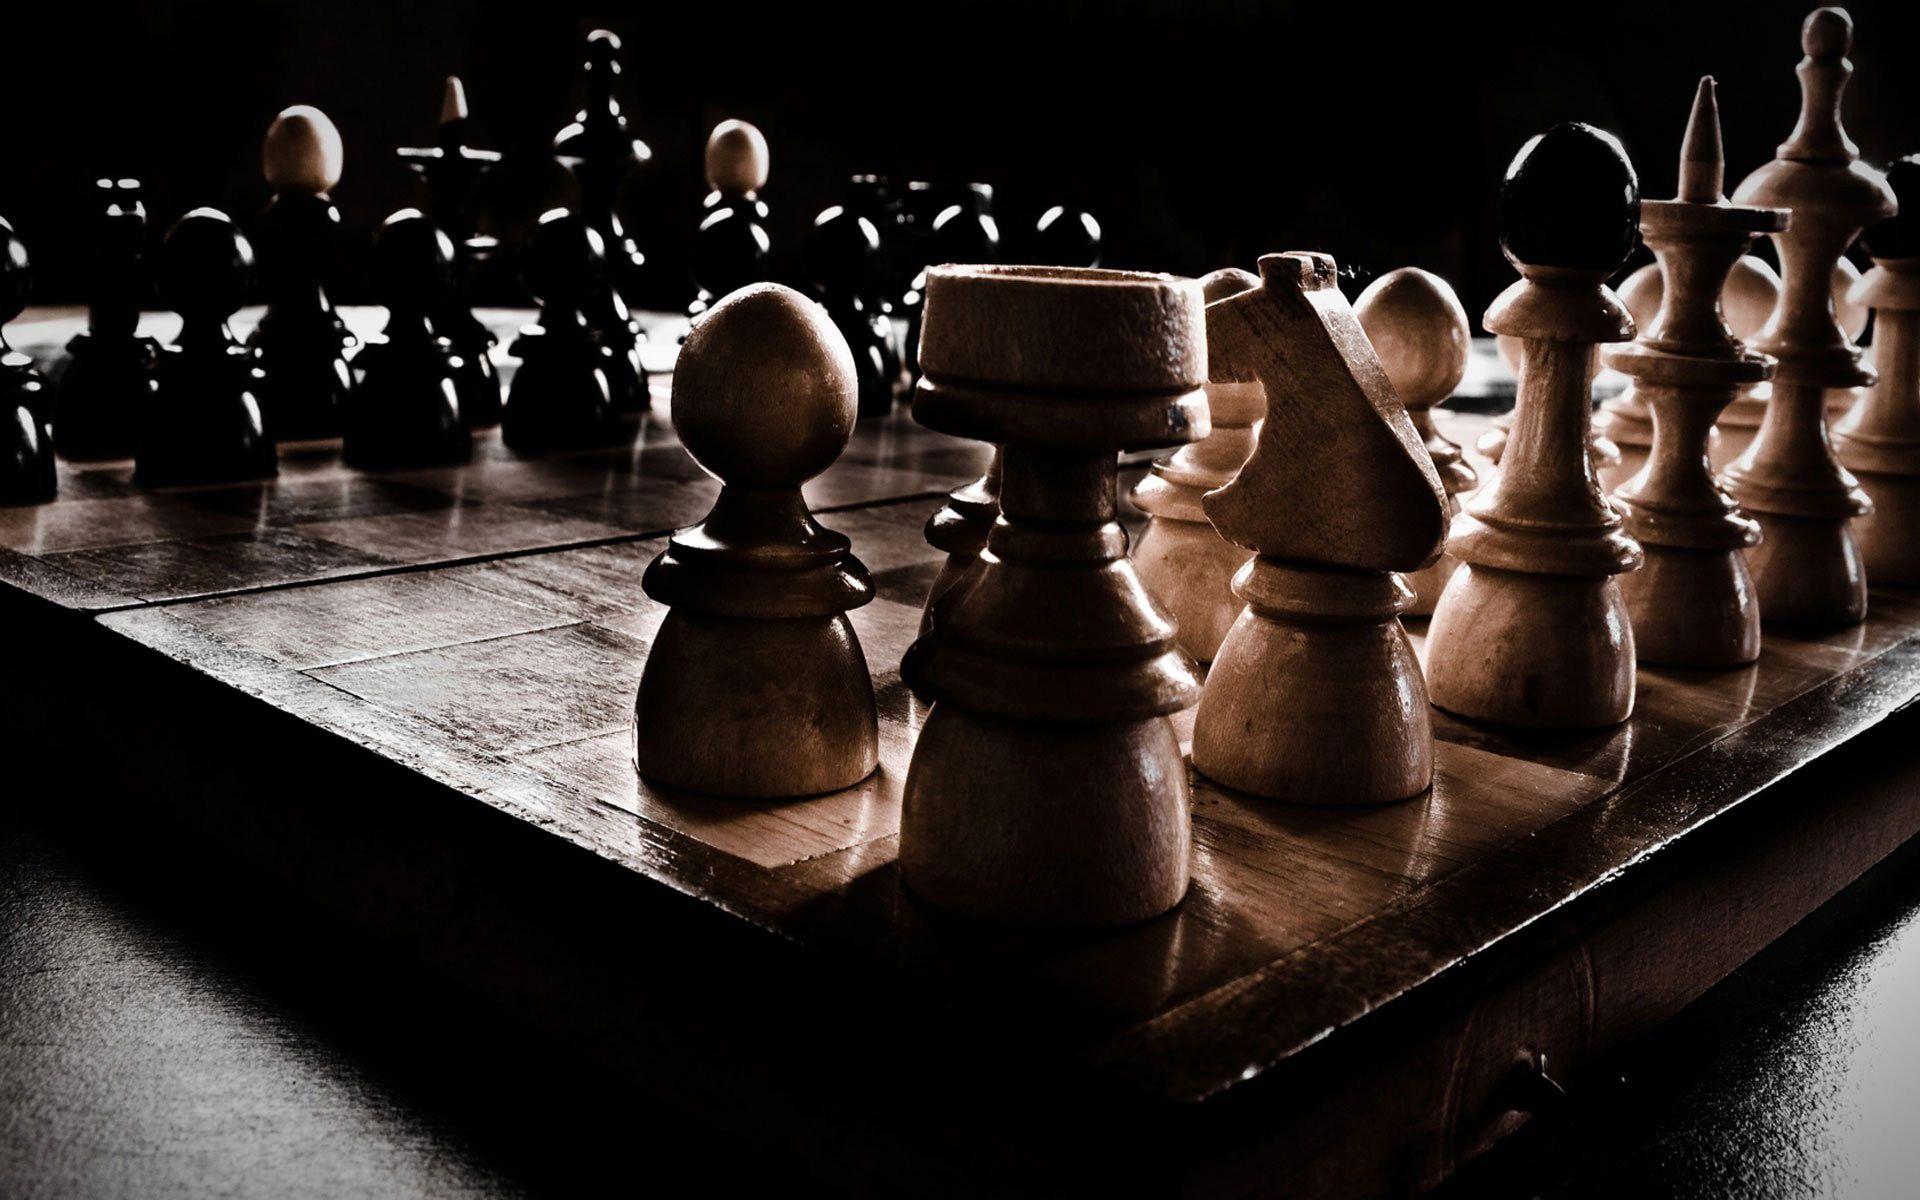 Fond d'écran hd jeu déchec Chess board, Chess, Chess